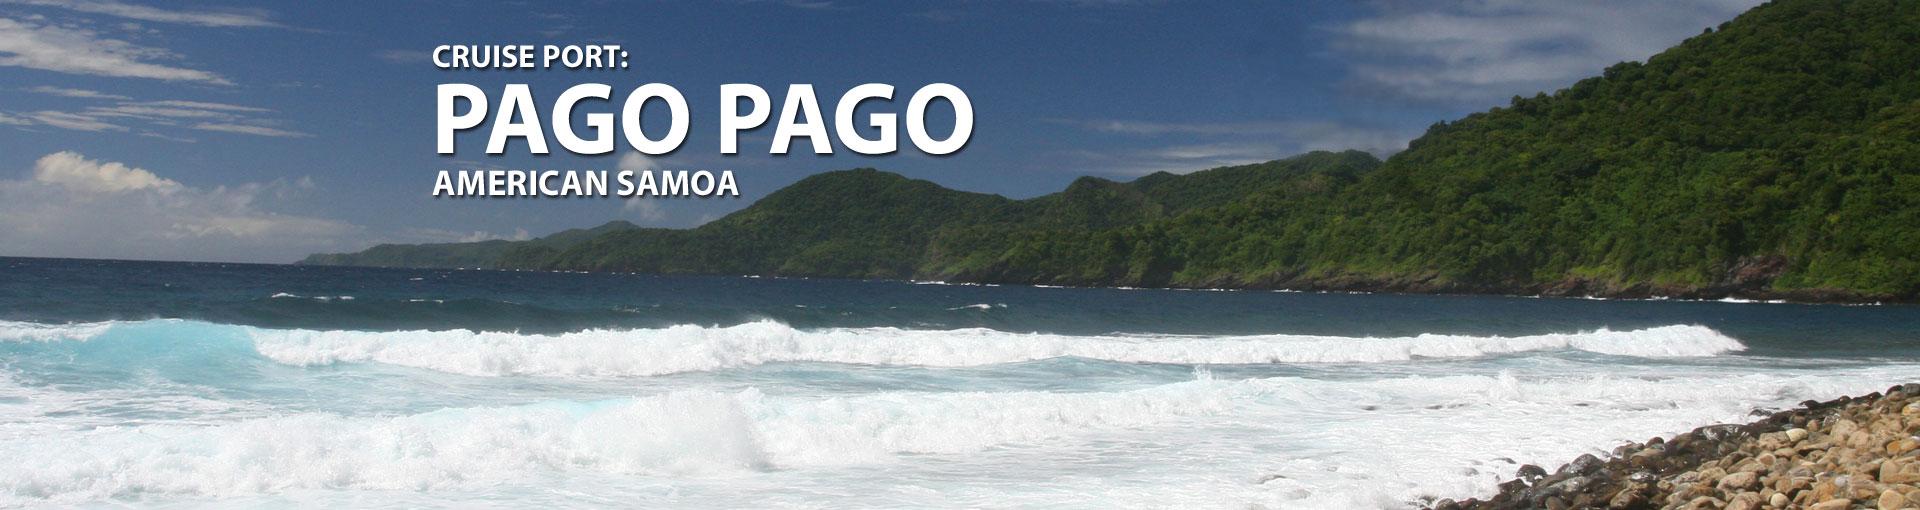 Cruises to Pago Pago, American Samoa